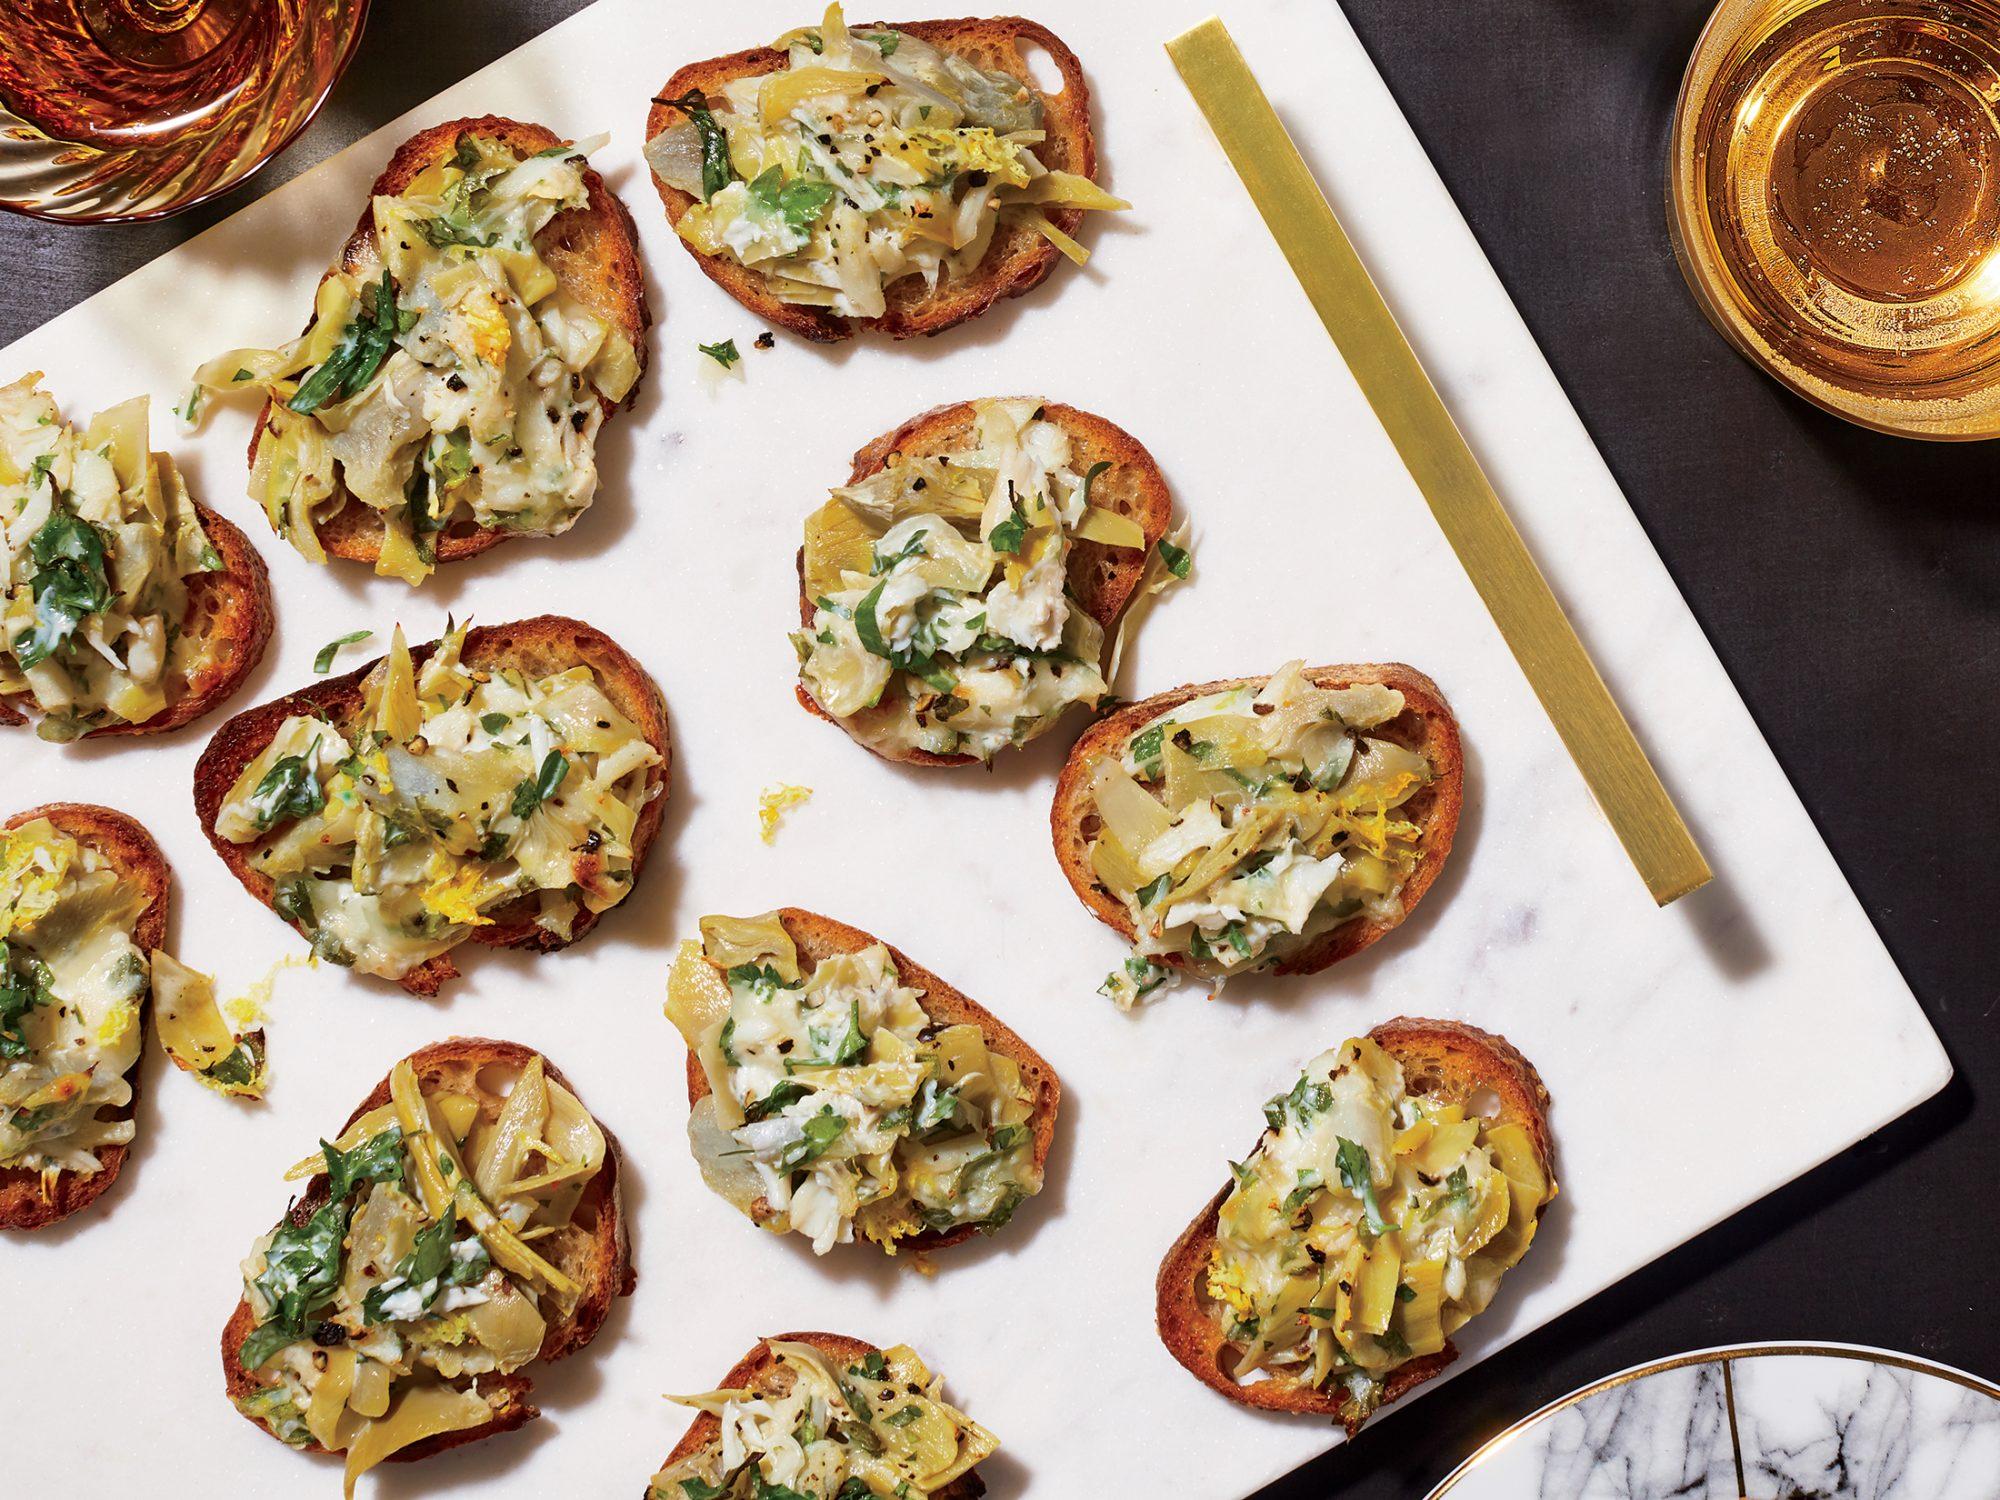 Cheesy Crab Artichoke Toasts